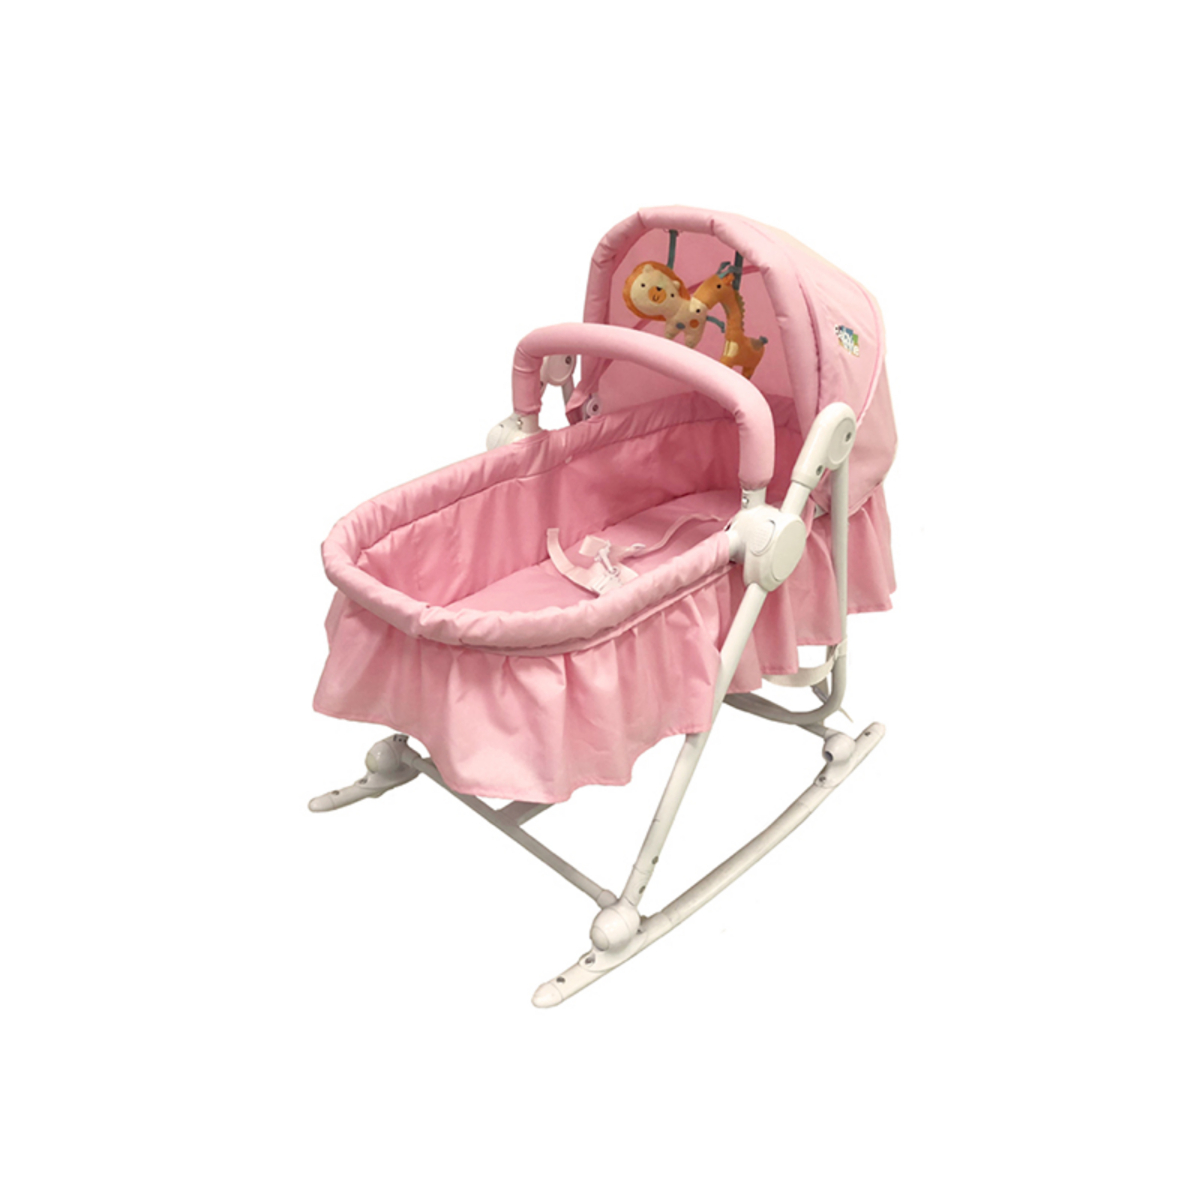 Moisés Bercinho Cadeira Descanso Sonequinha Baby Style Rosa